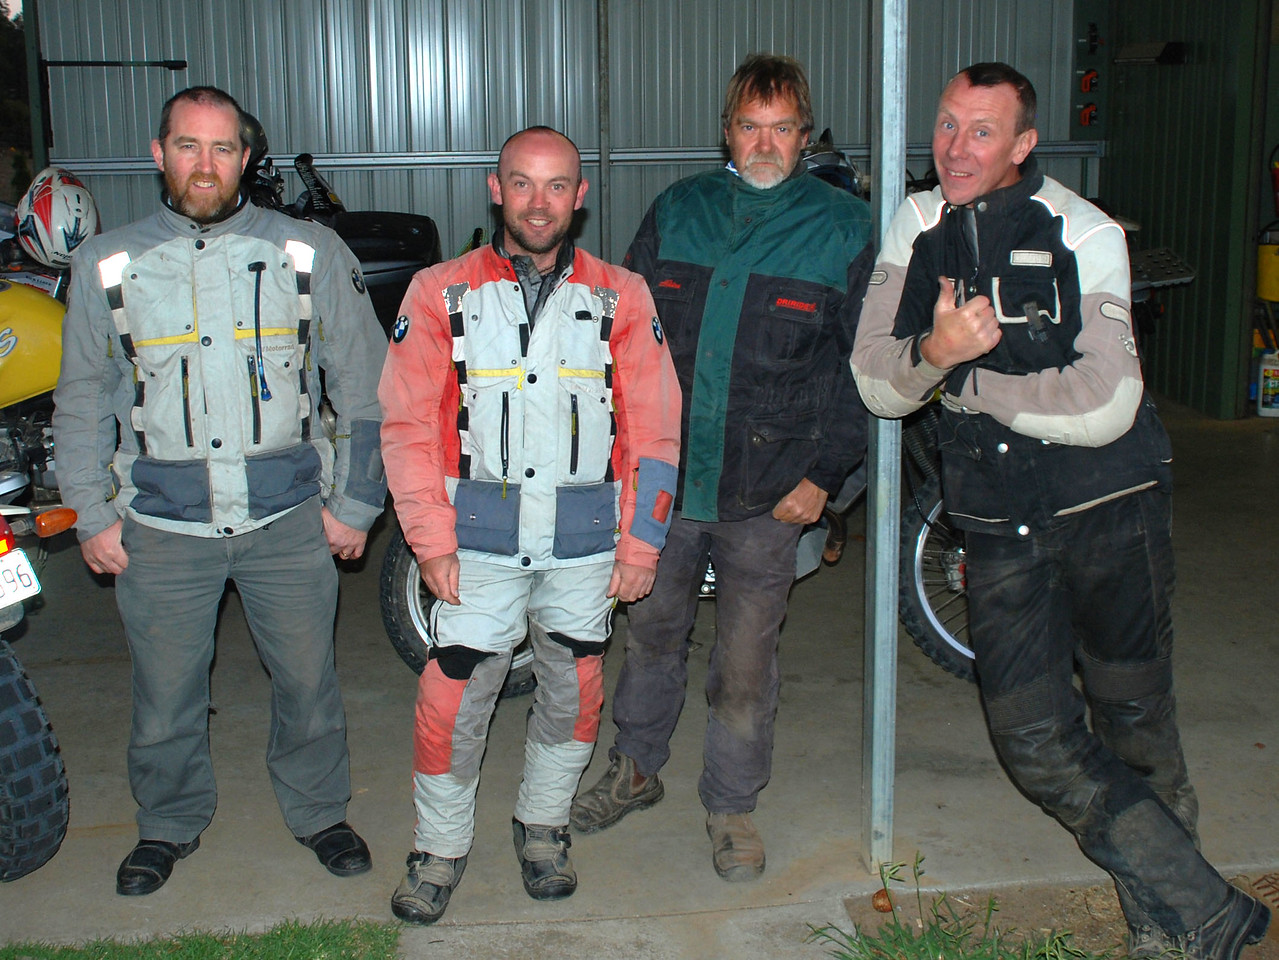 Trevor, Adam, Graeme, Tim @ Dave's, Victoria